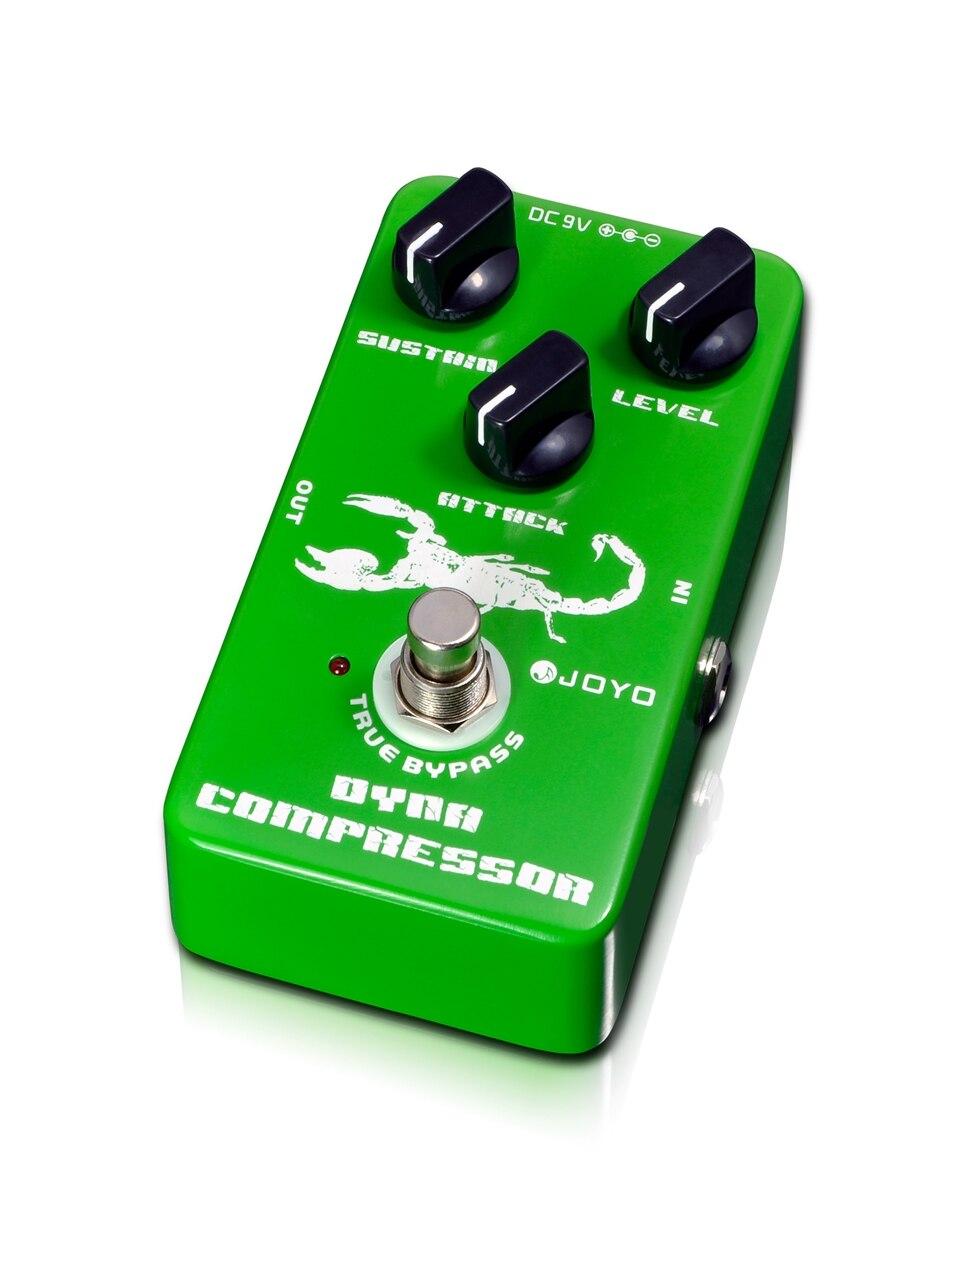 JOYO Dynamic Compressor Gitarren-Effektpedal Low Noice Speziell für Bass und High Output Active Pickup